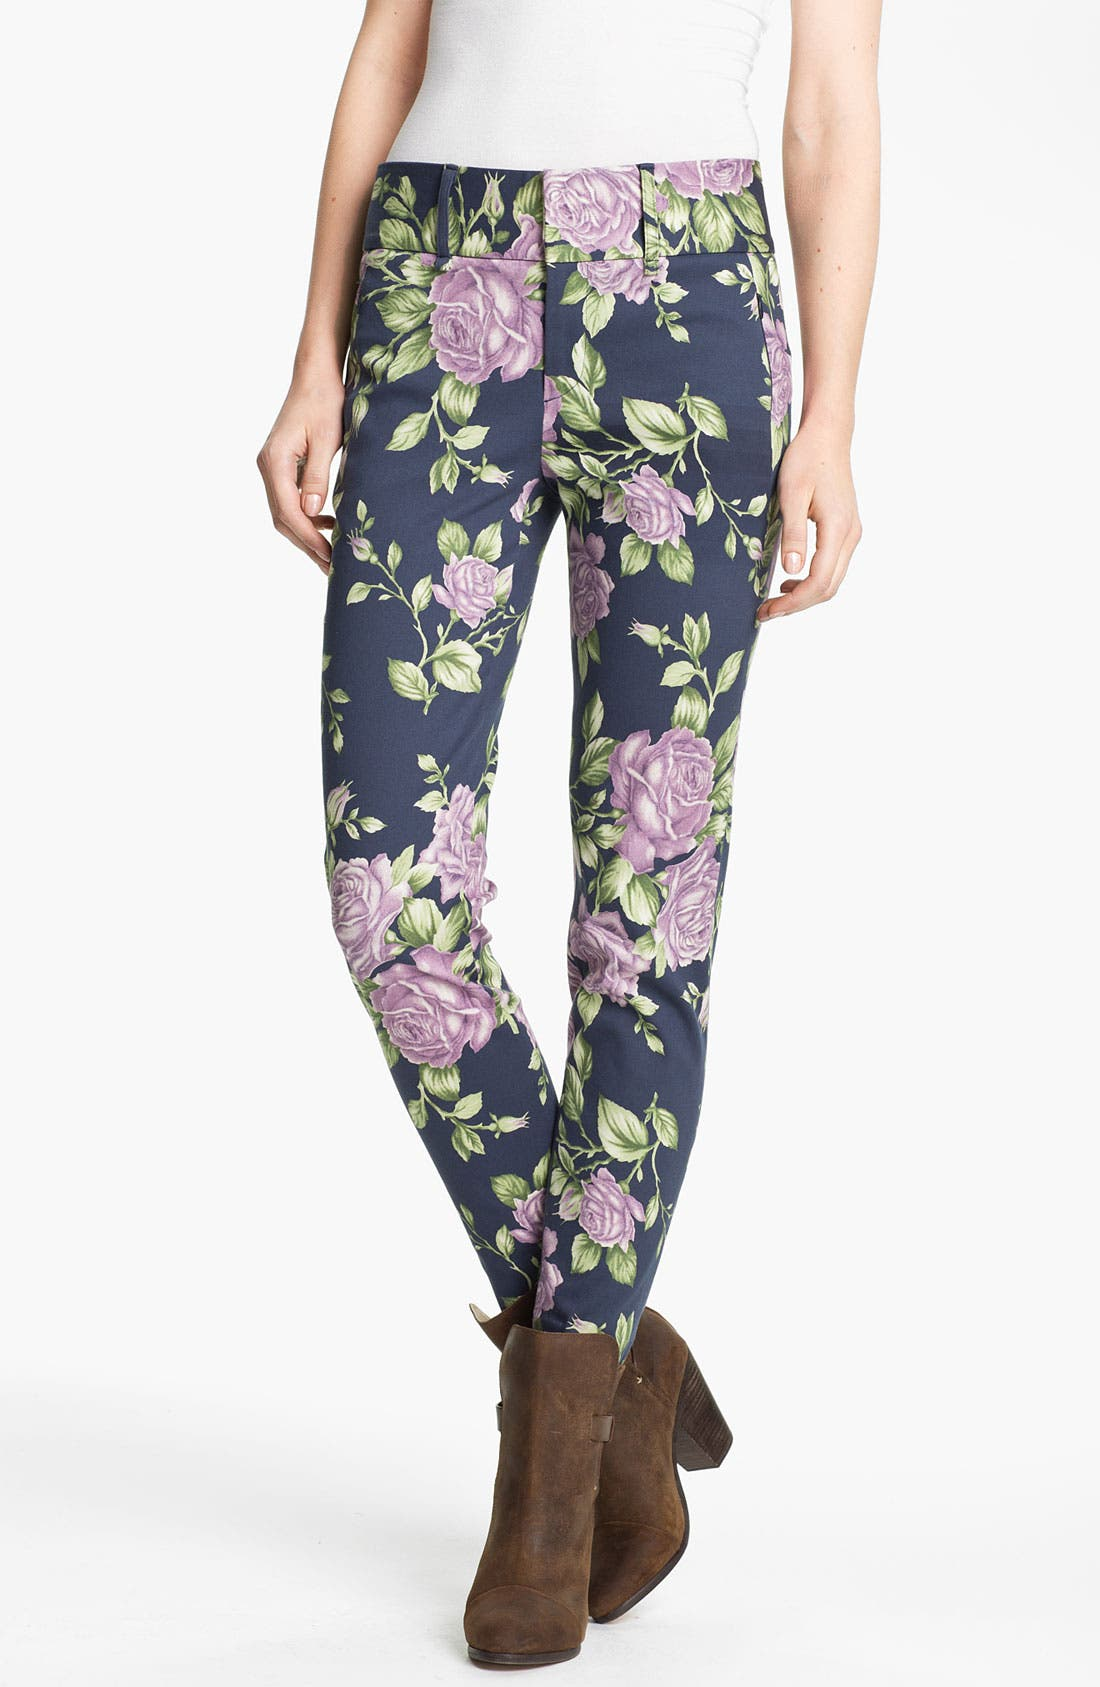 Alternate Image 1 Selected - rag & bone 'Malin' Floral Print Skinny Stretch Pants